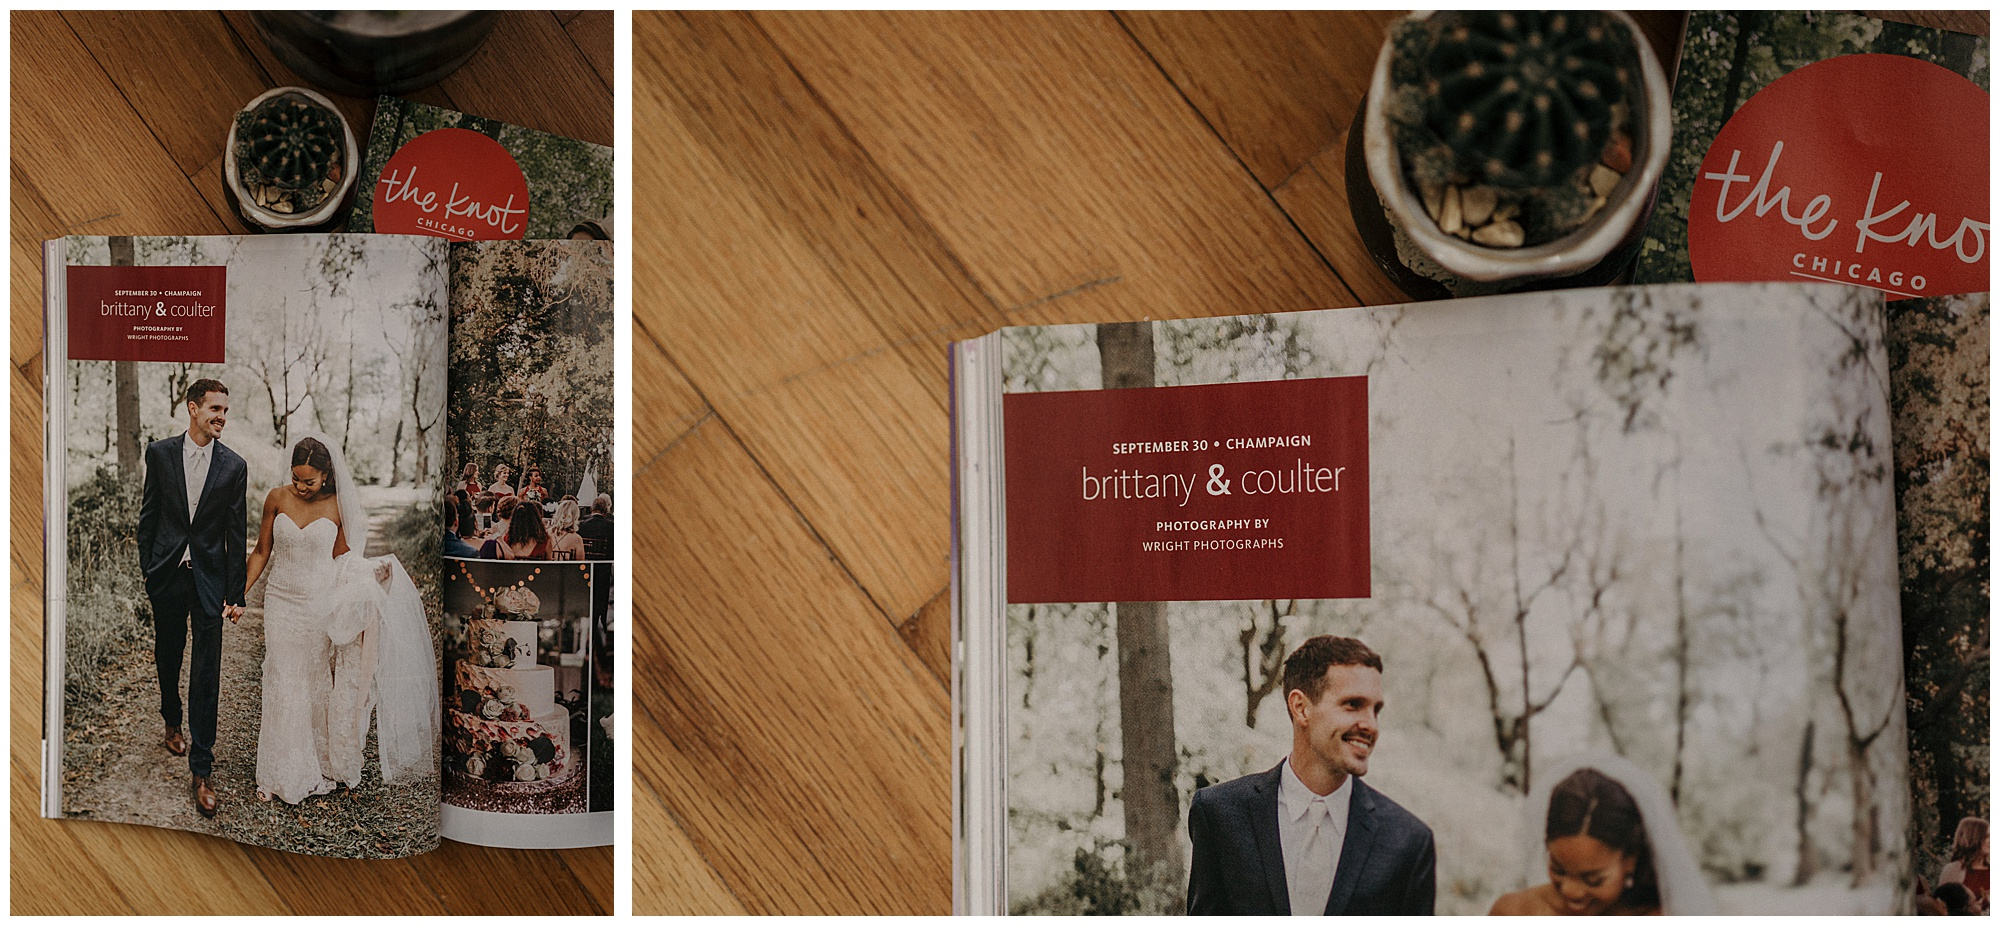 chicago_wedding_photographer_champaign_the_knot_magazine_prairie_glass_house_wright_photographs_0011.jpg